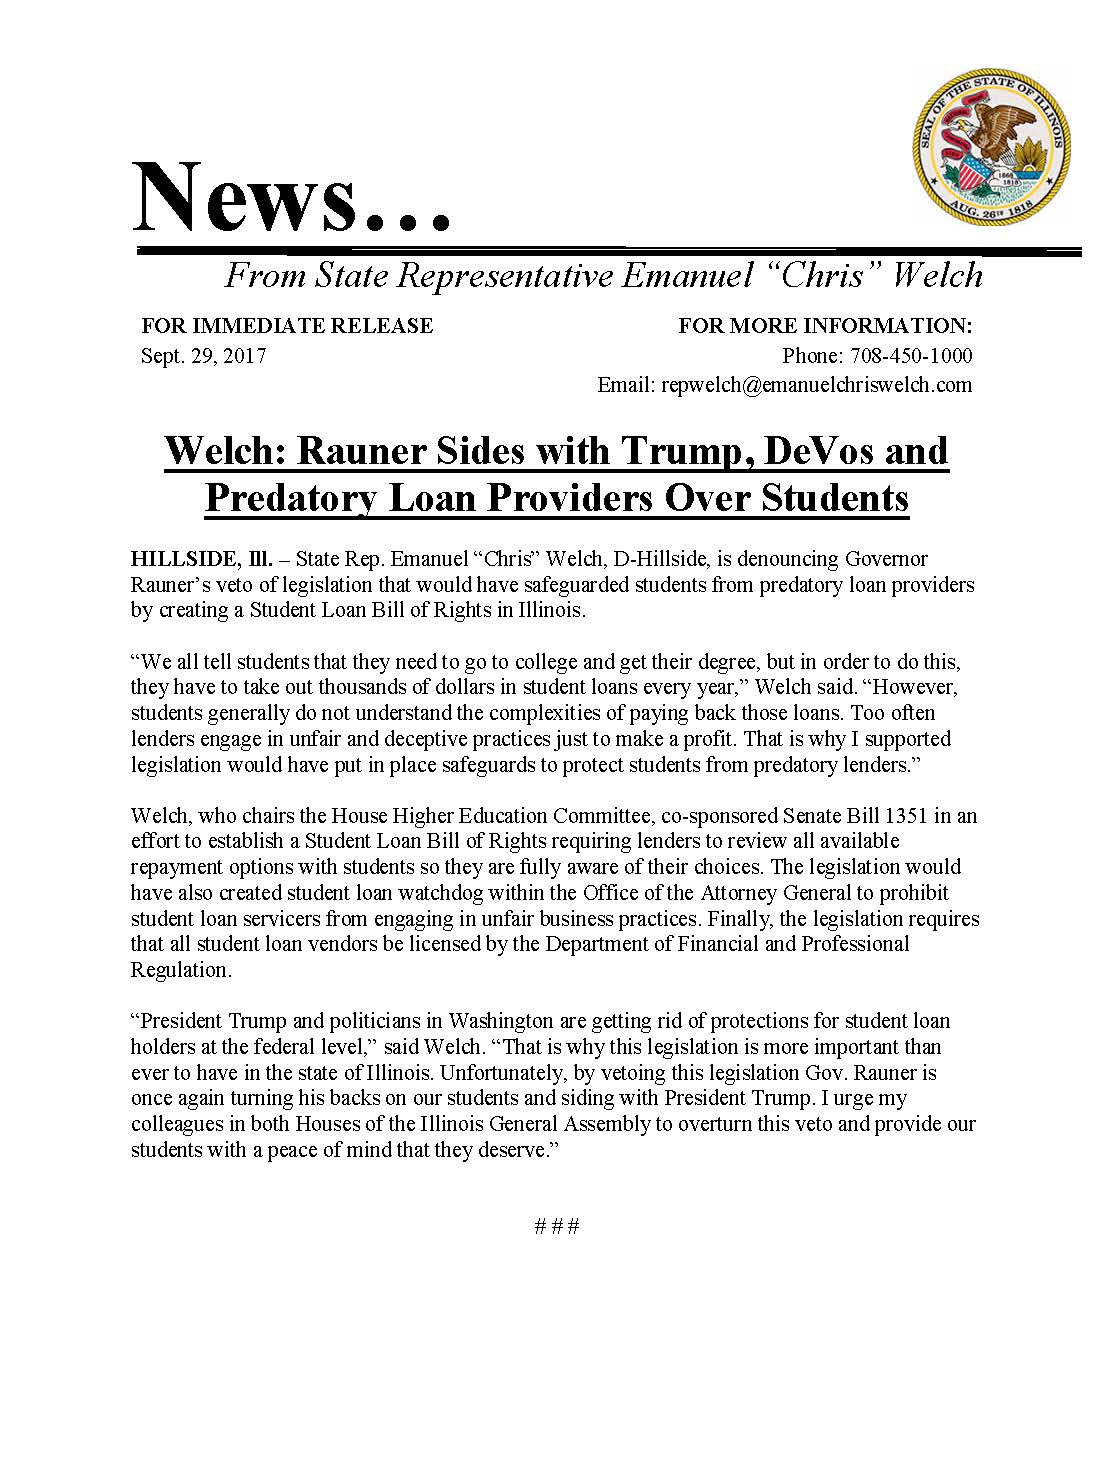 Welch: Rauner Sides with Trump  (September 29, 2017)